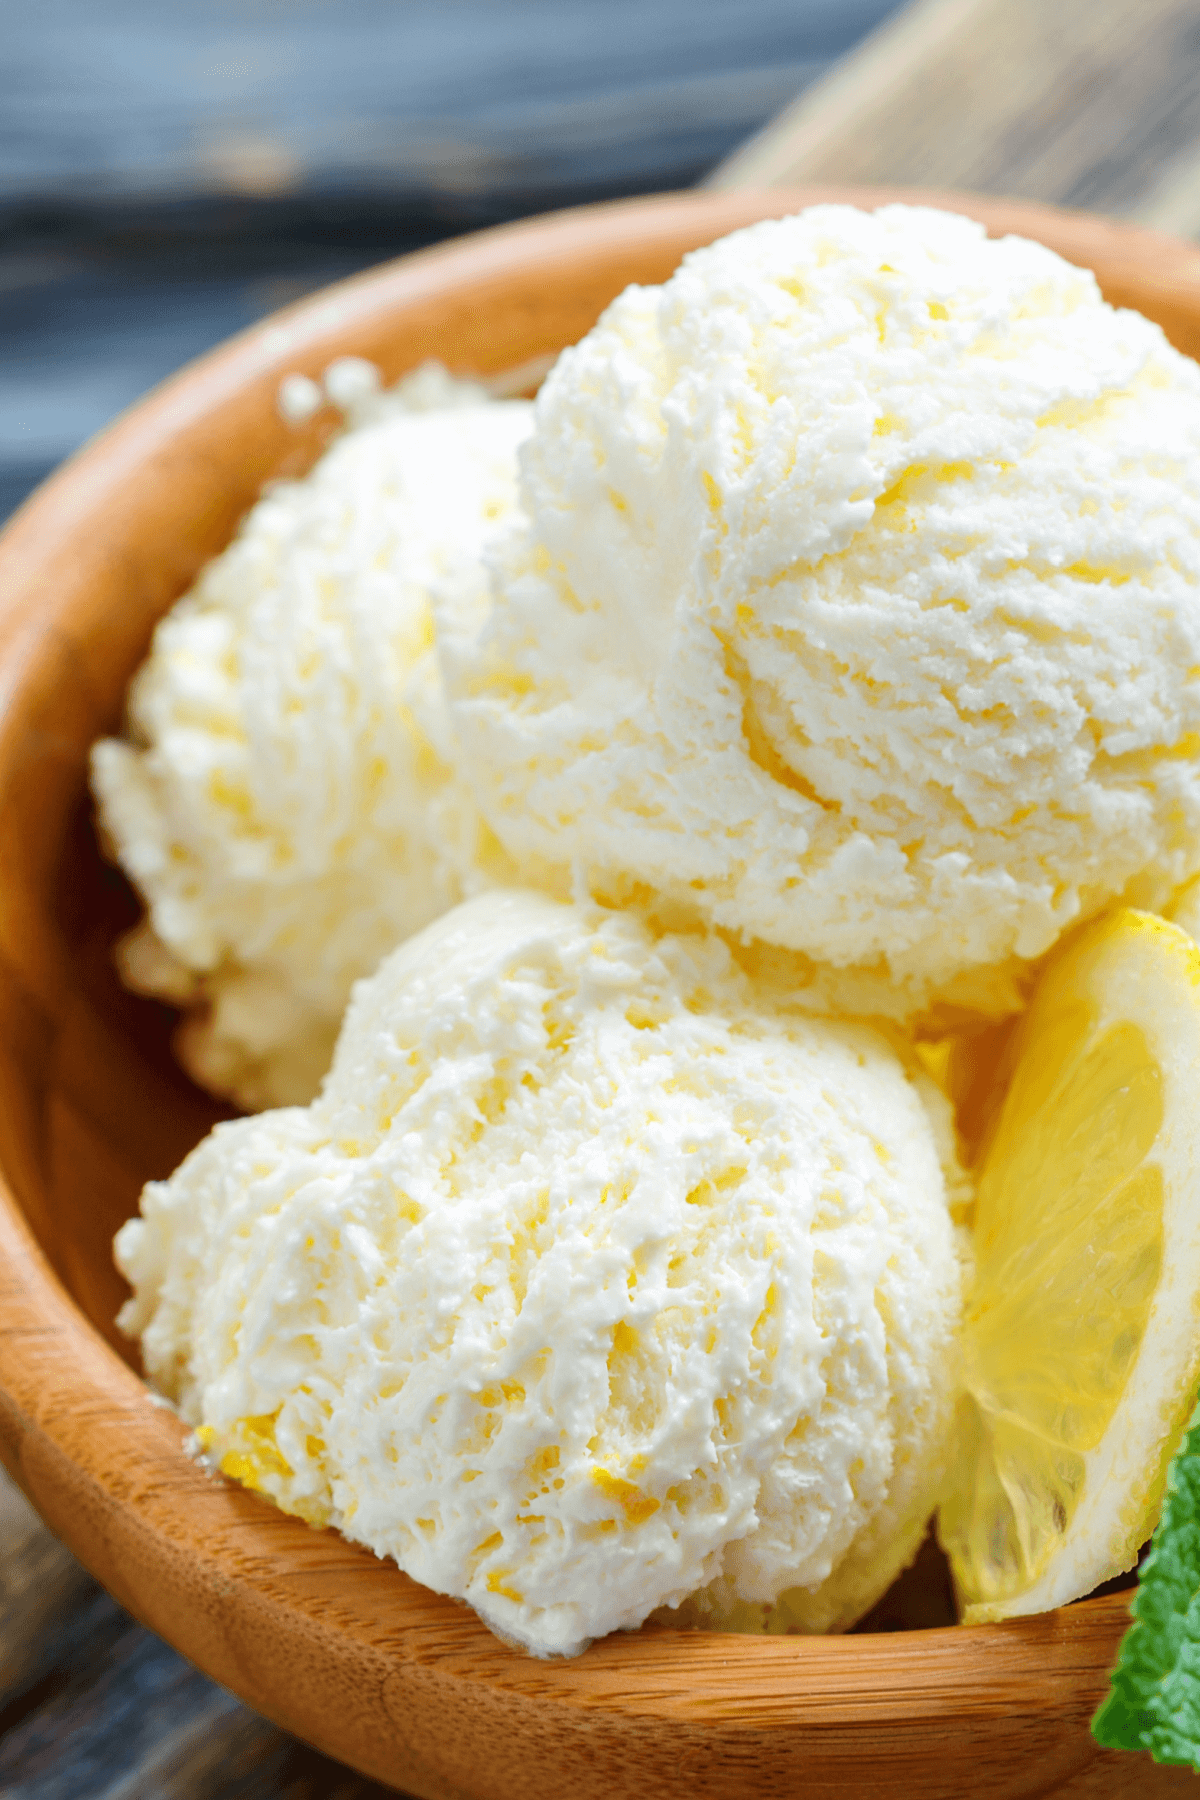 Lemon No-churn ice cream in bowl.